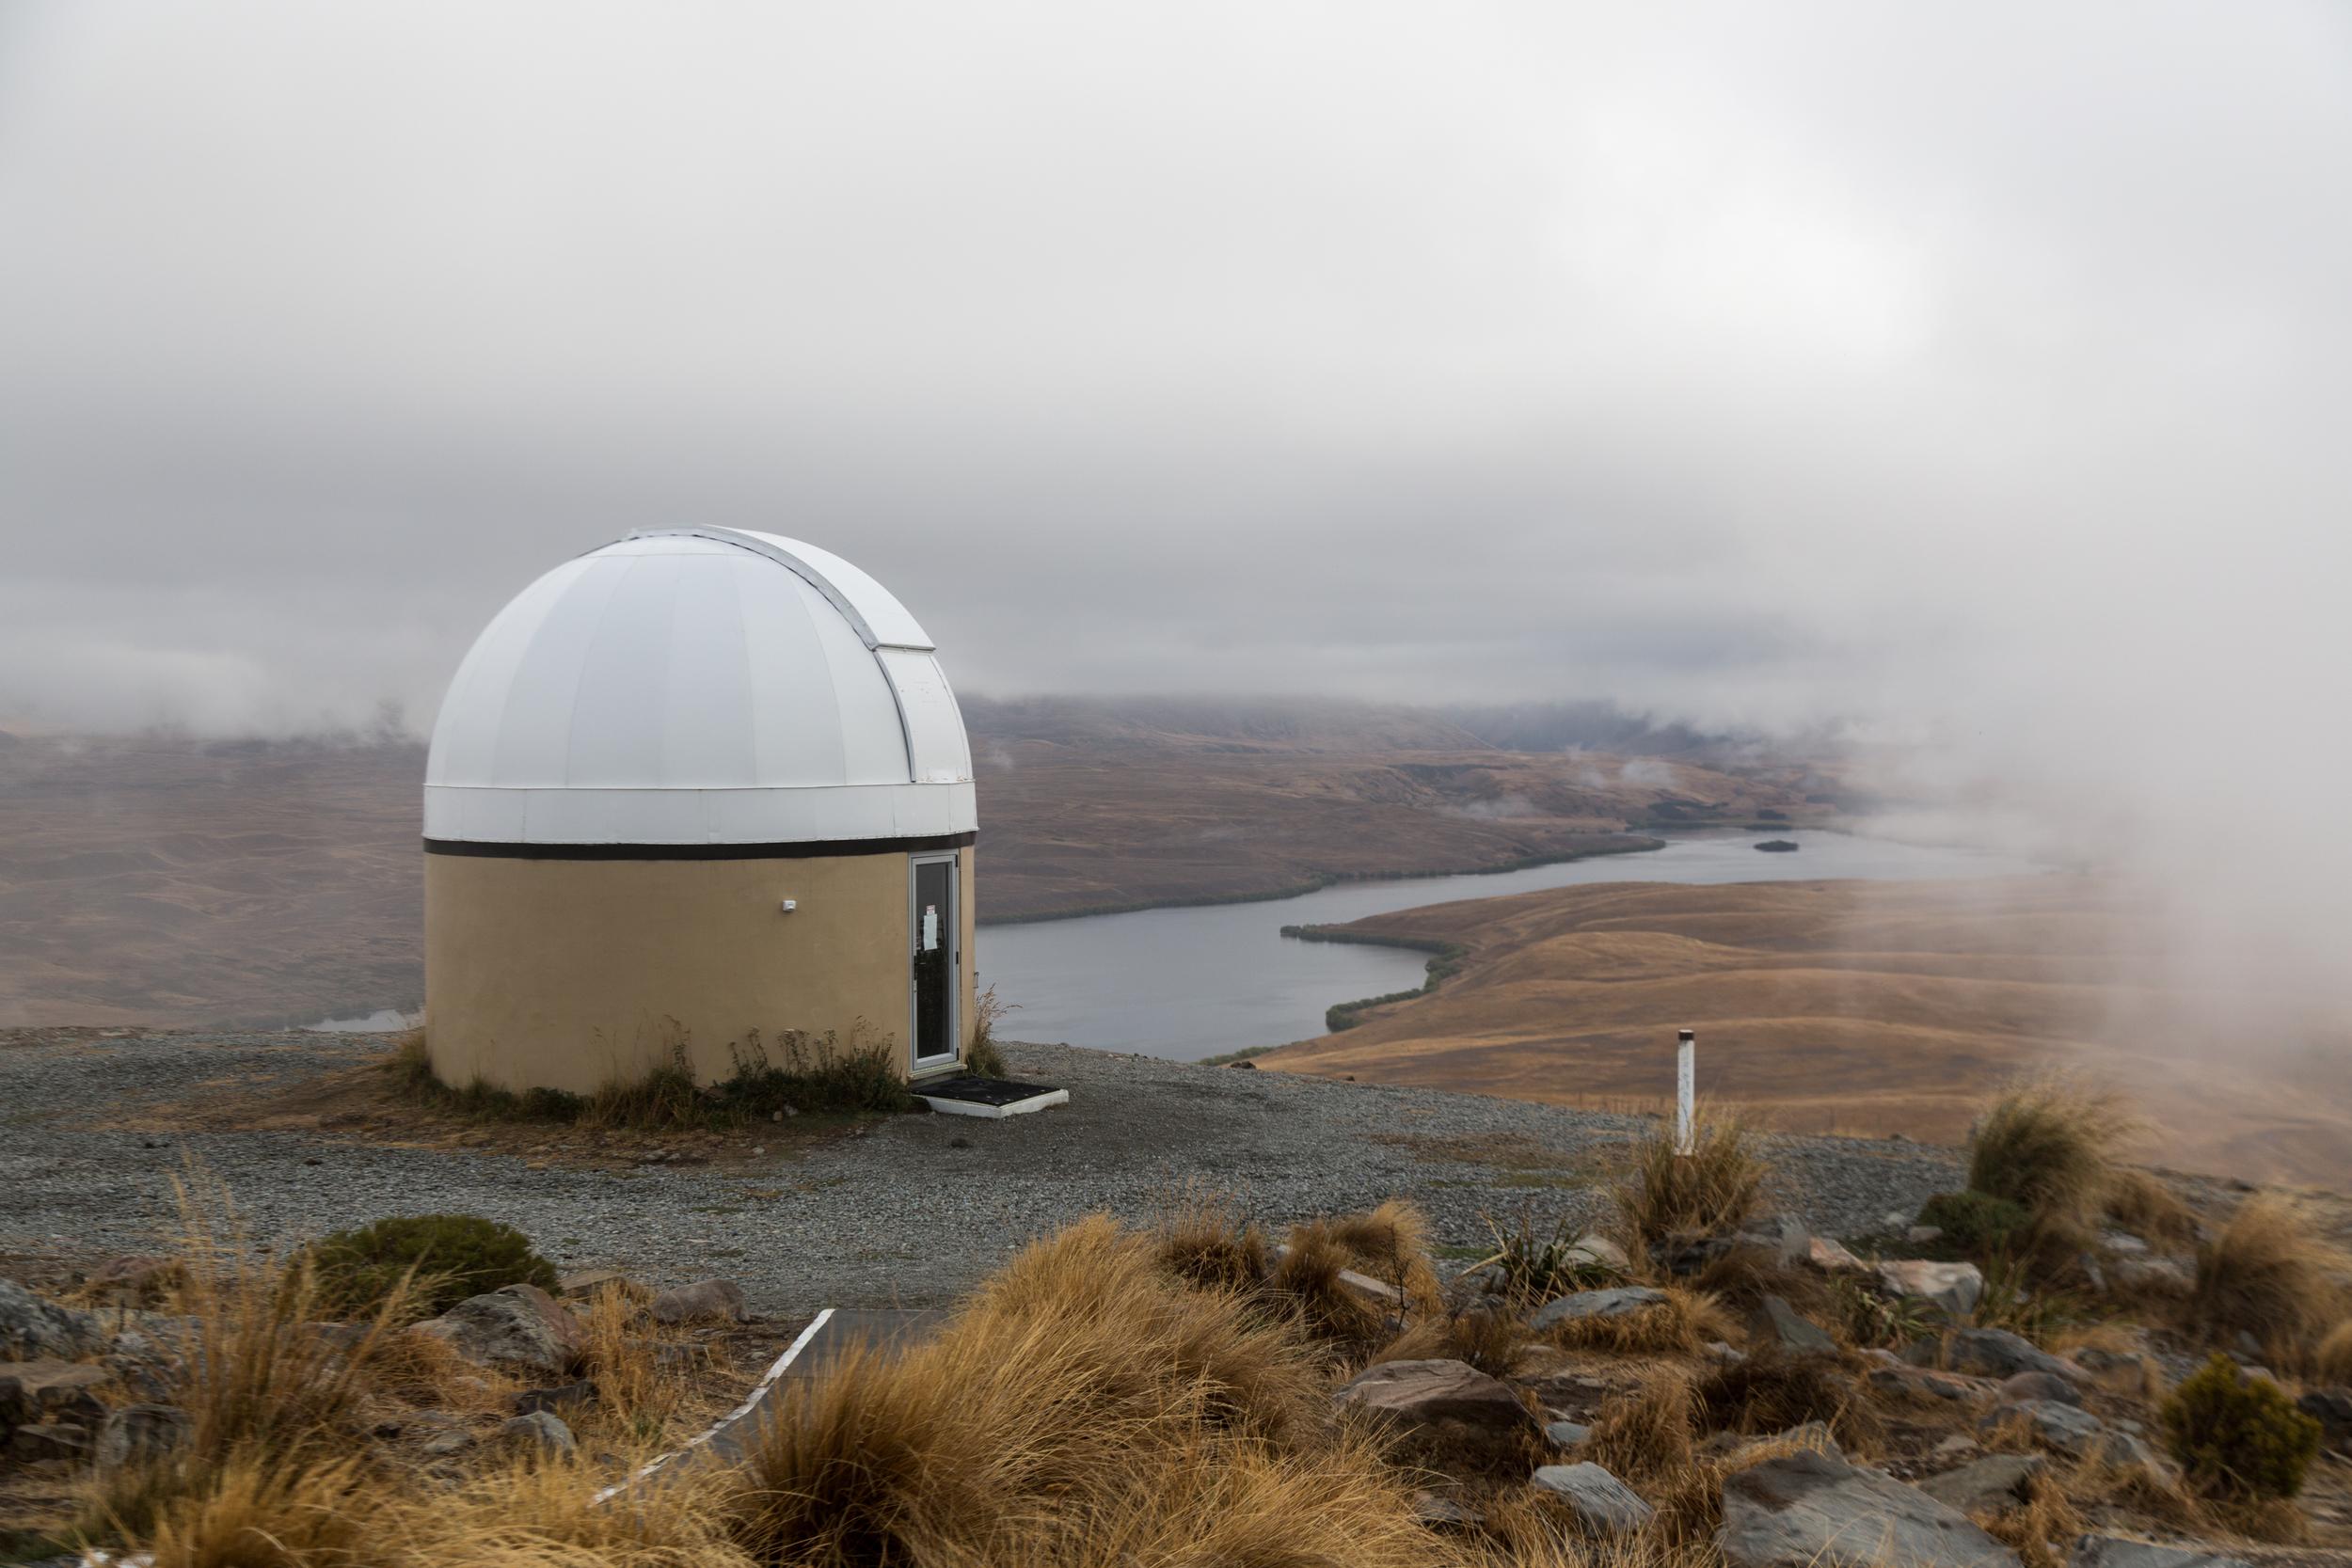 Tekapo Observatory